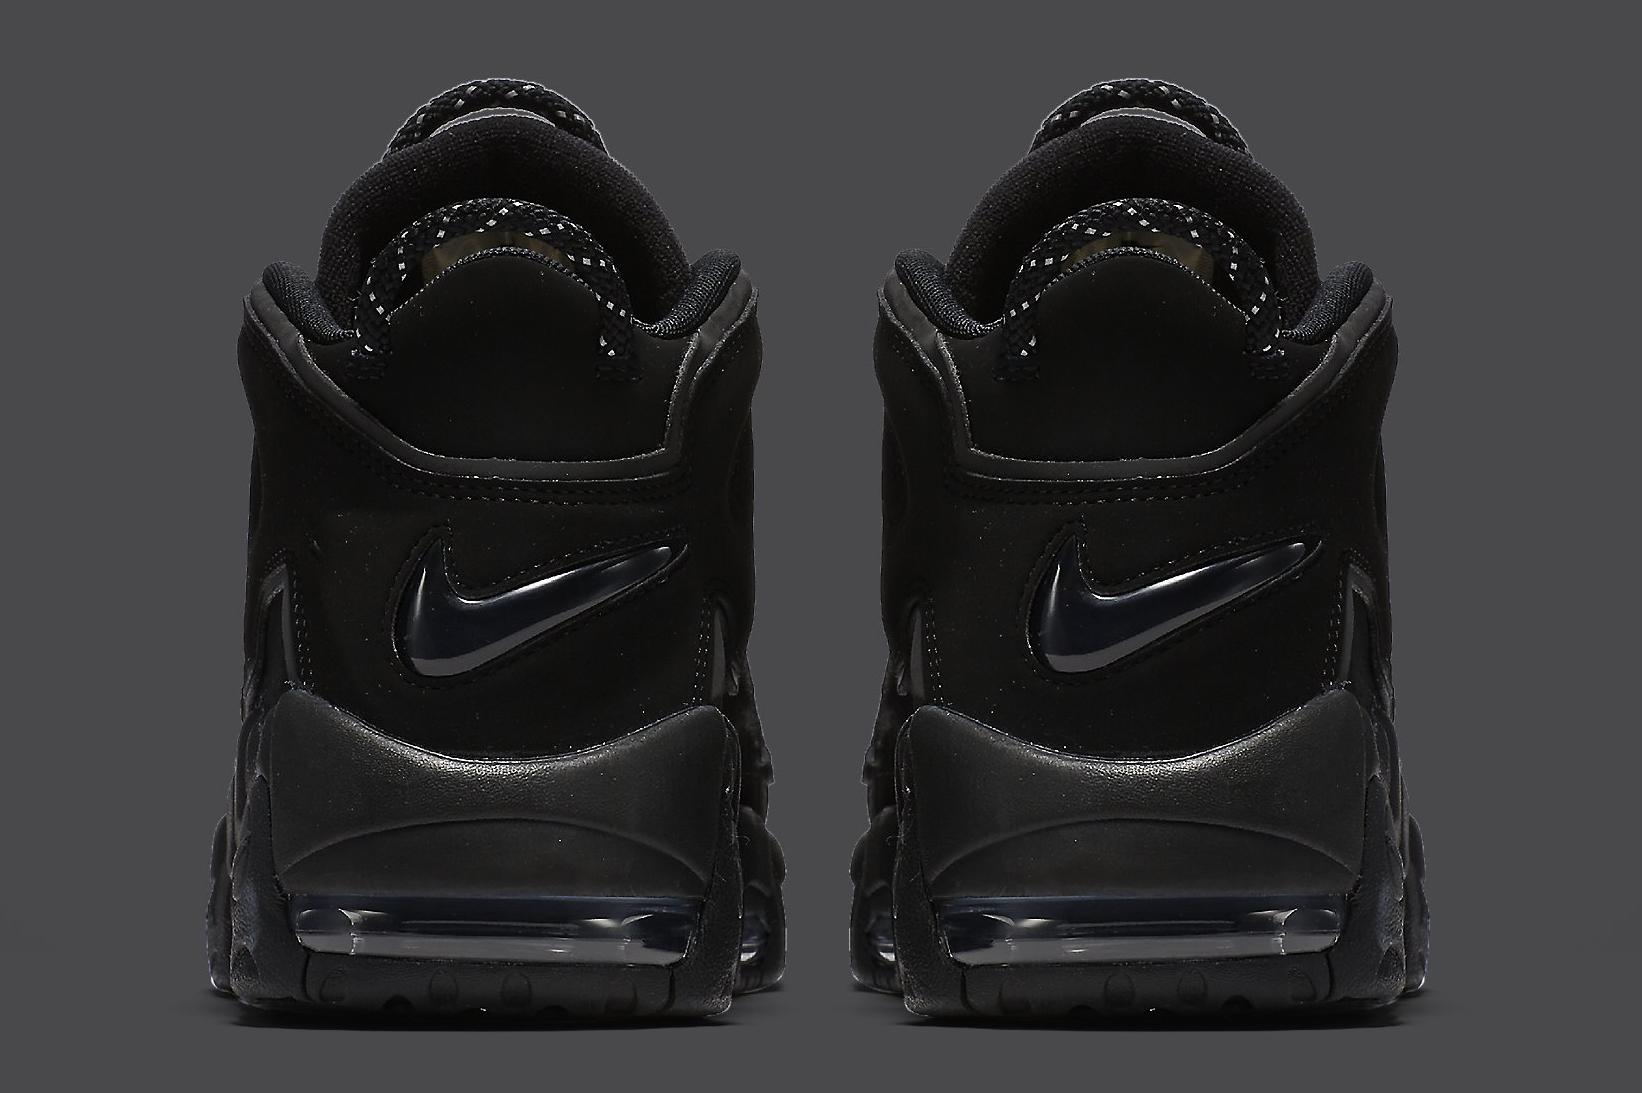 Nike Air More Uptempo Black Reflective 414962-004 Heel